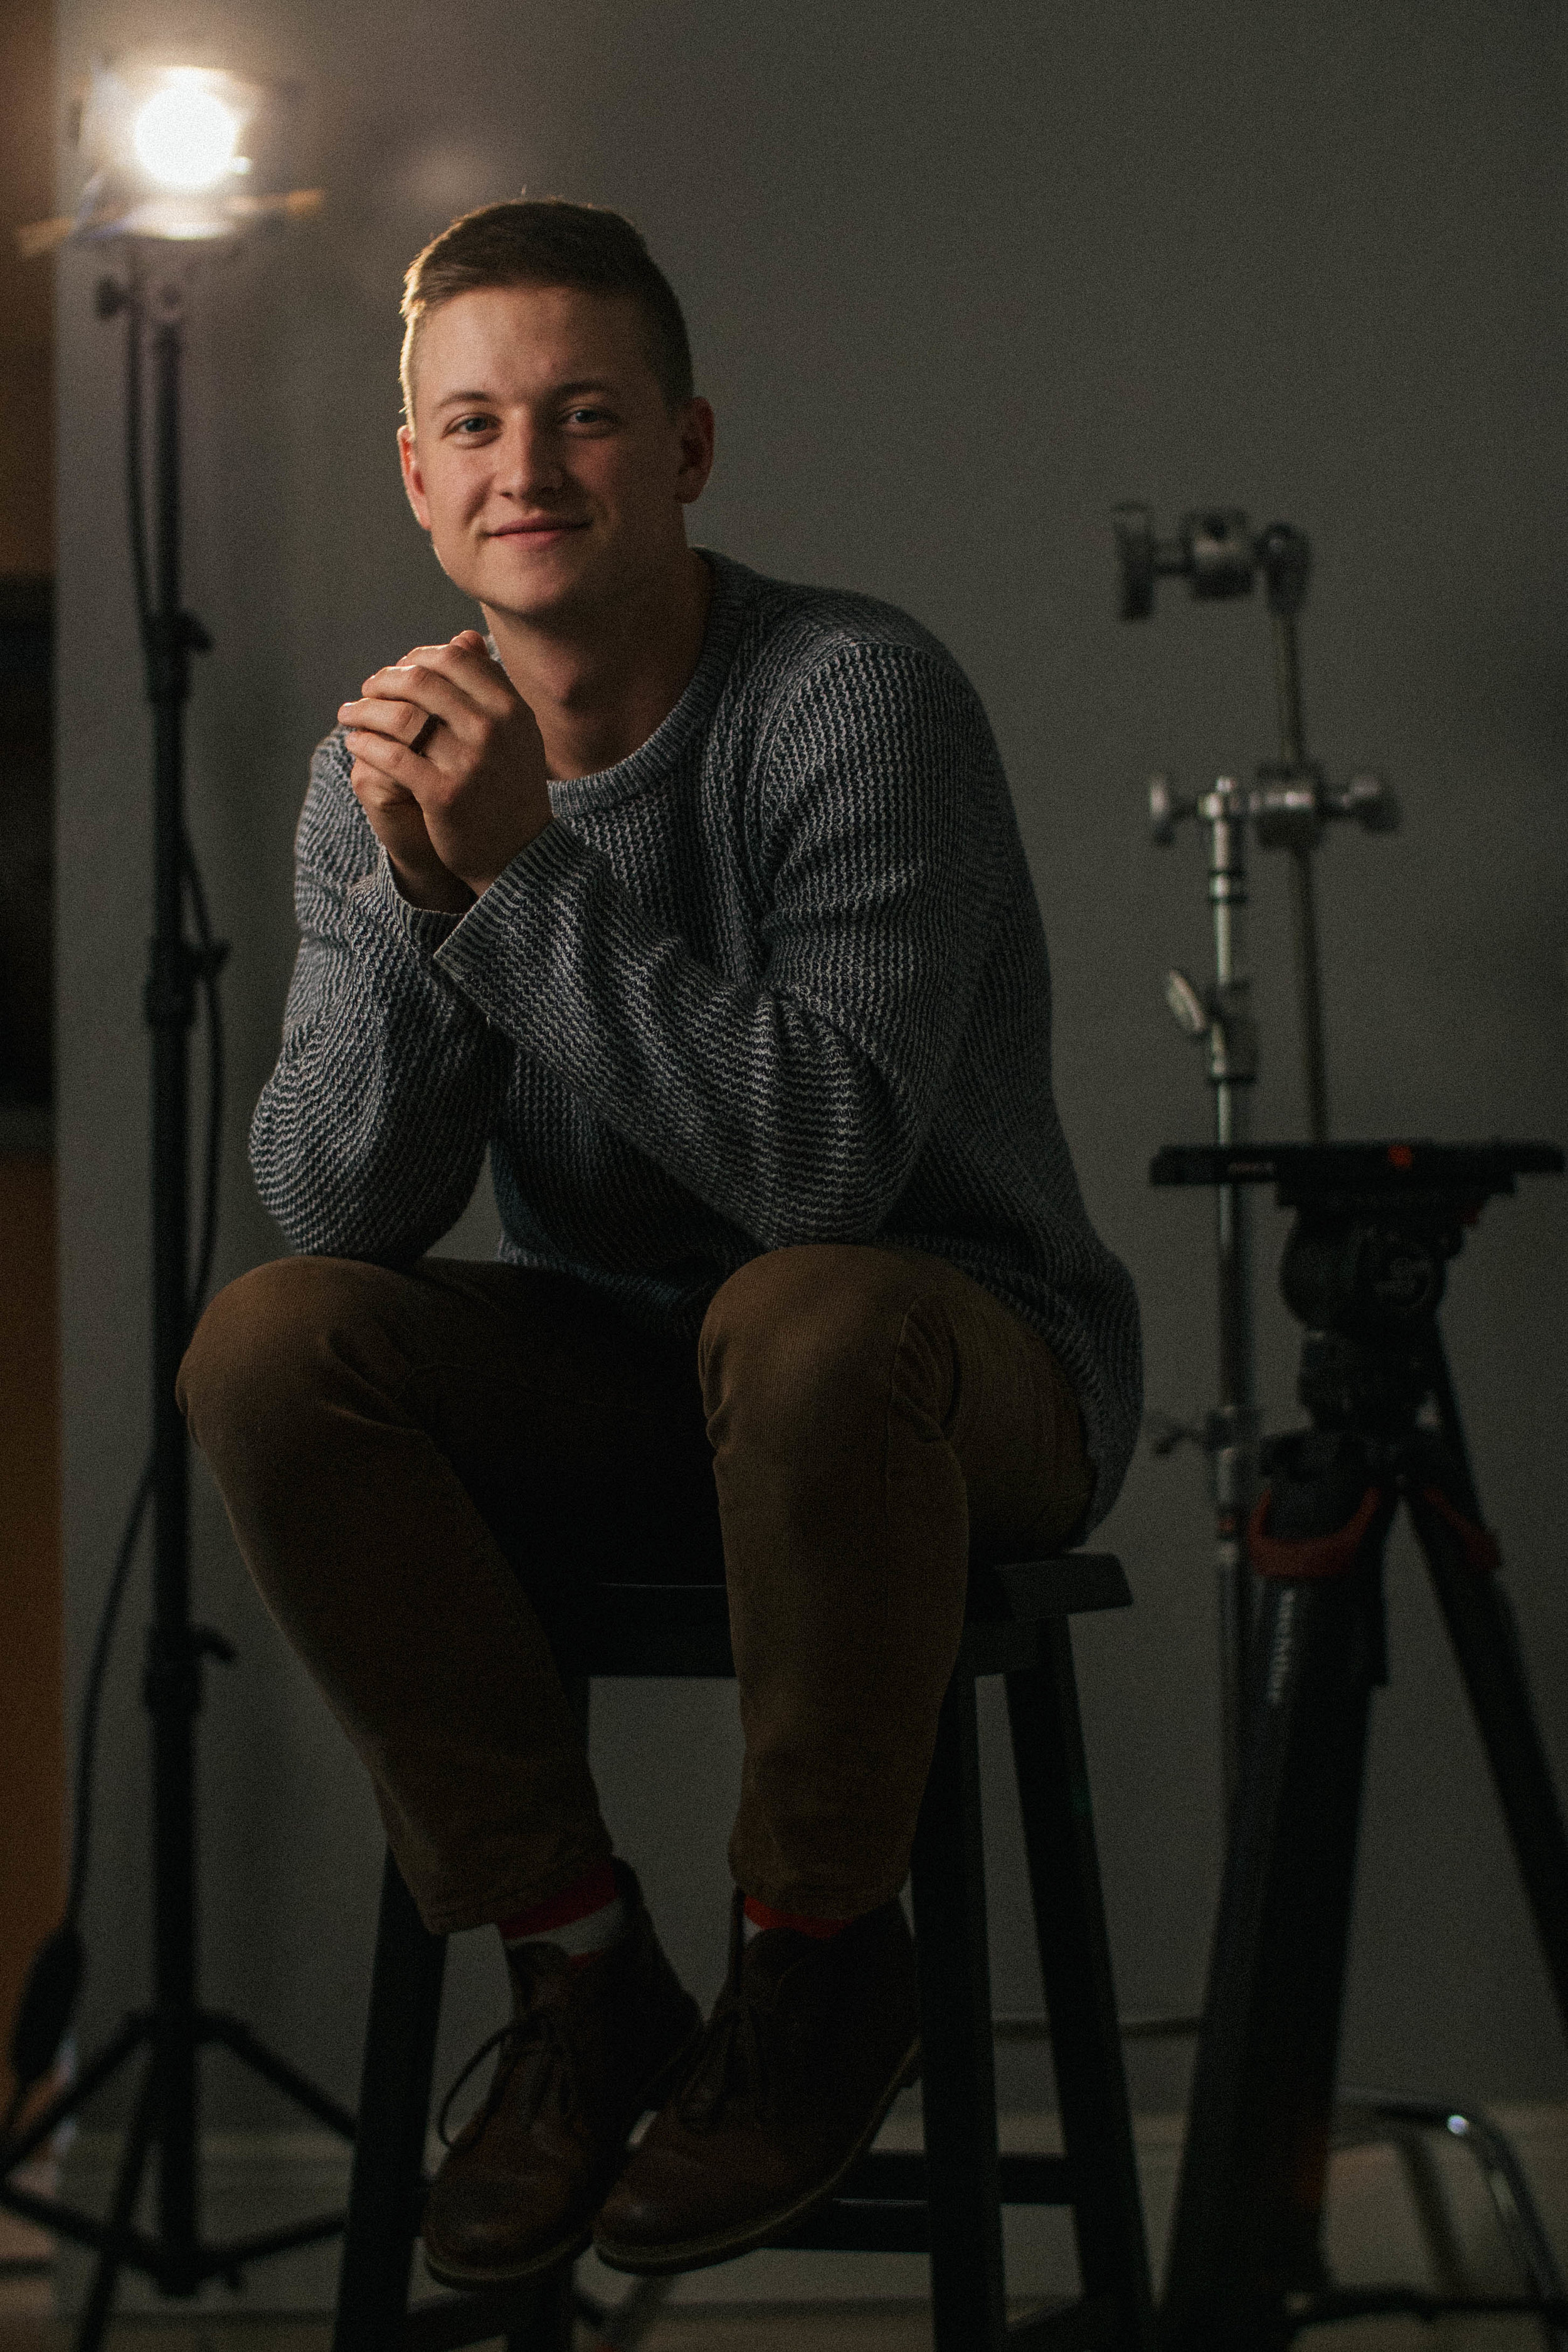 Zach / Cinematographer, Editor